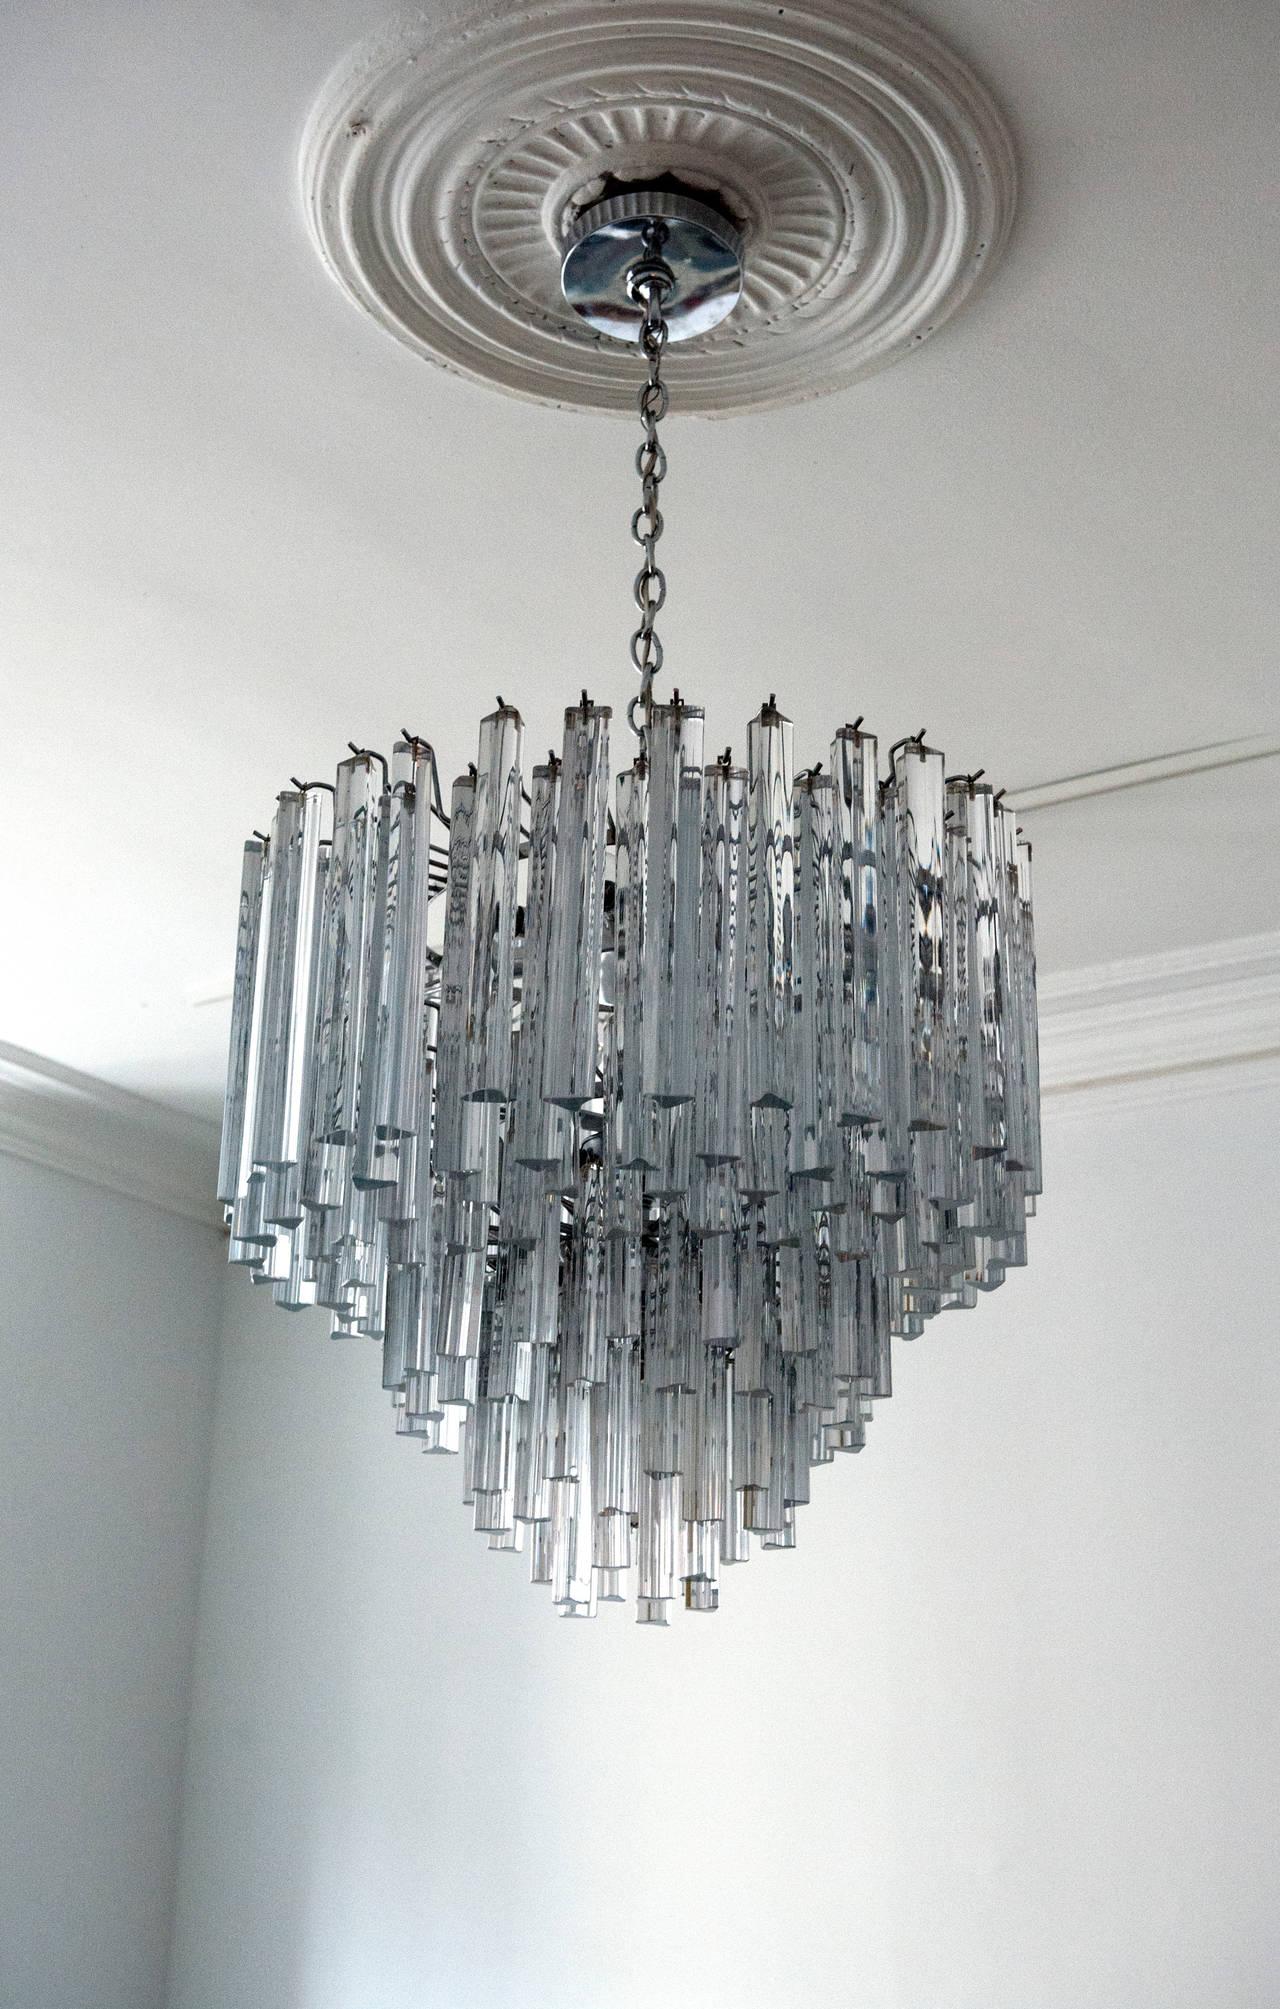 Modern italian crystal venini chandelier by camer at 1stdibs mid century modern modern italian crystal venini chandelier by camer for sale mozeypictures Images